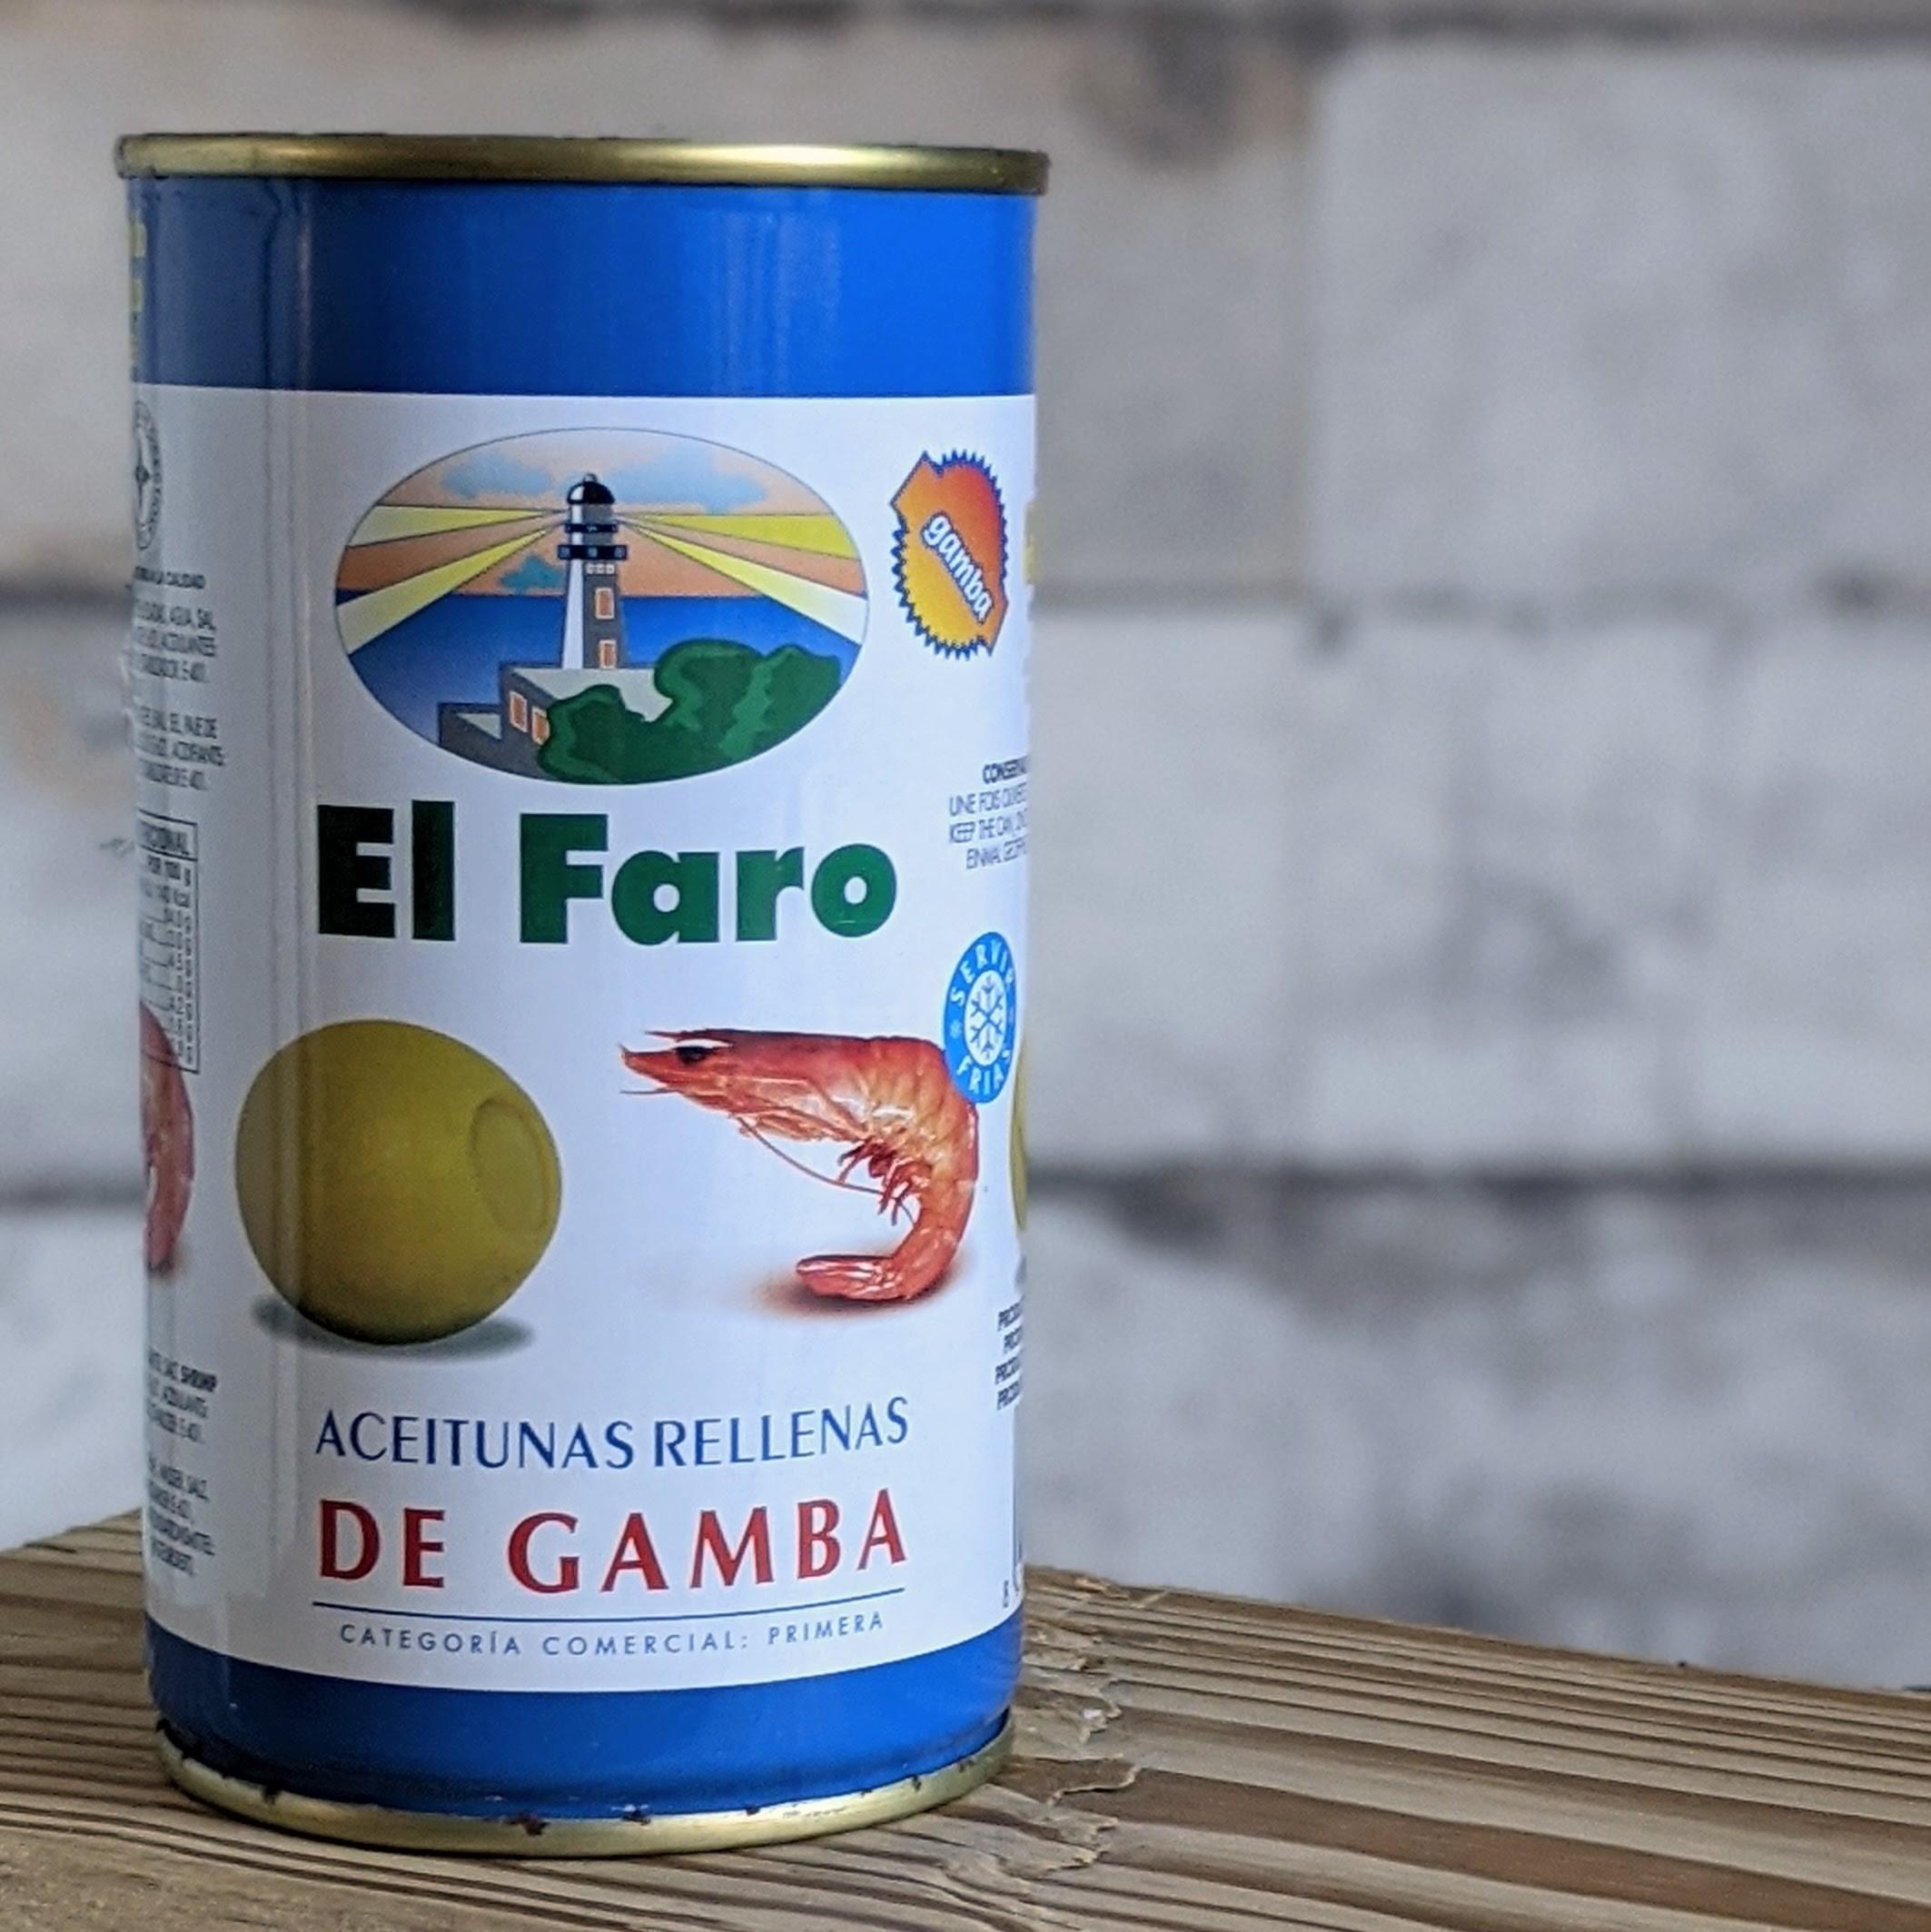 El Faro Grüne Oliven de Gamba, 350g